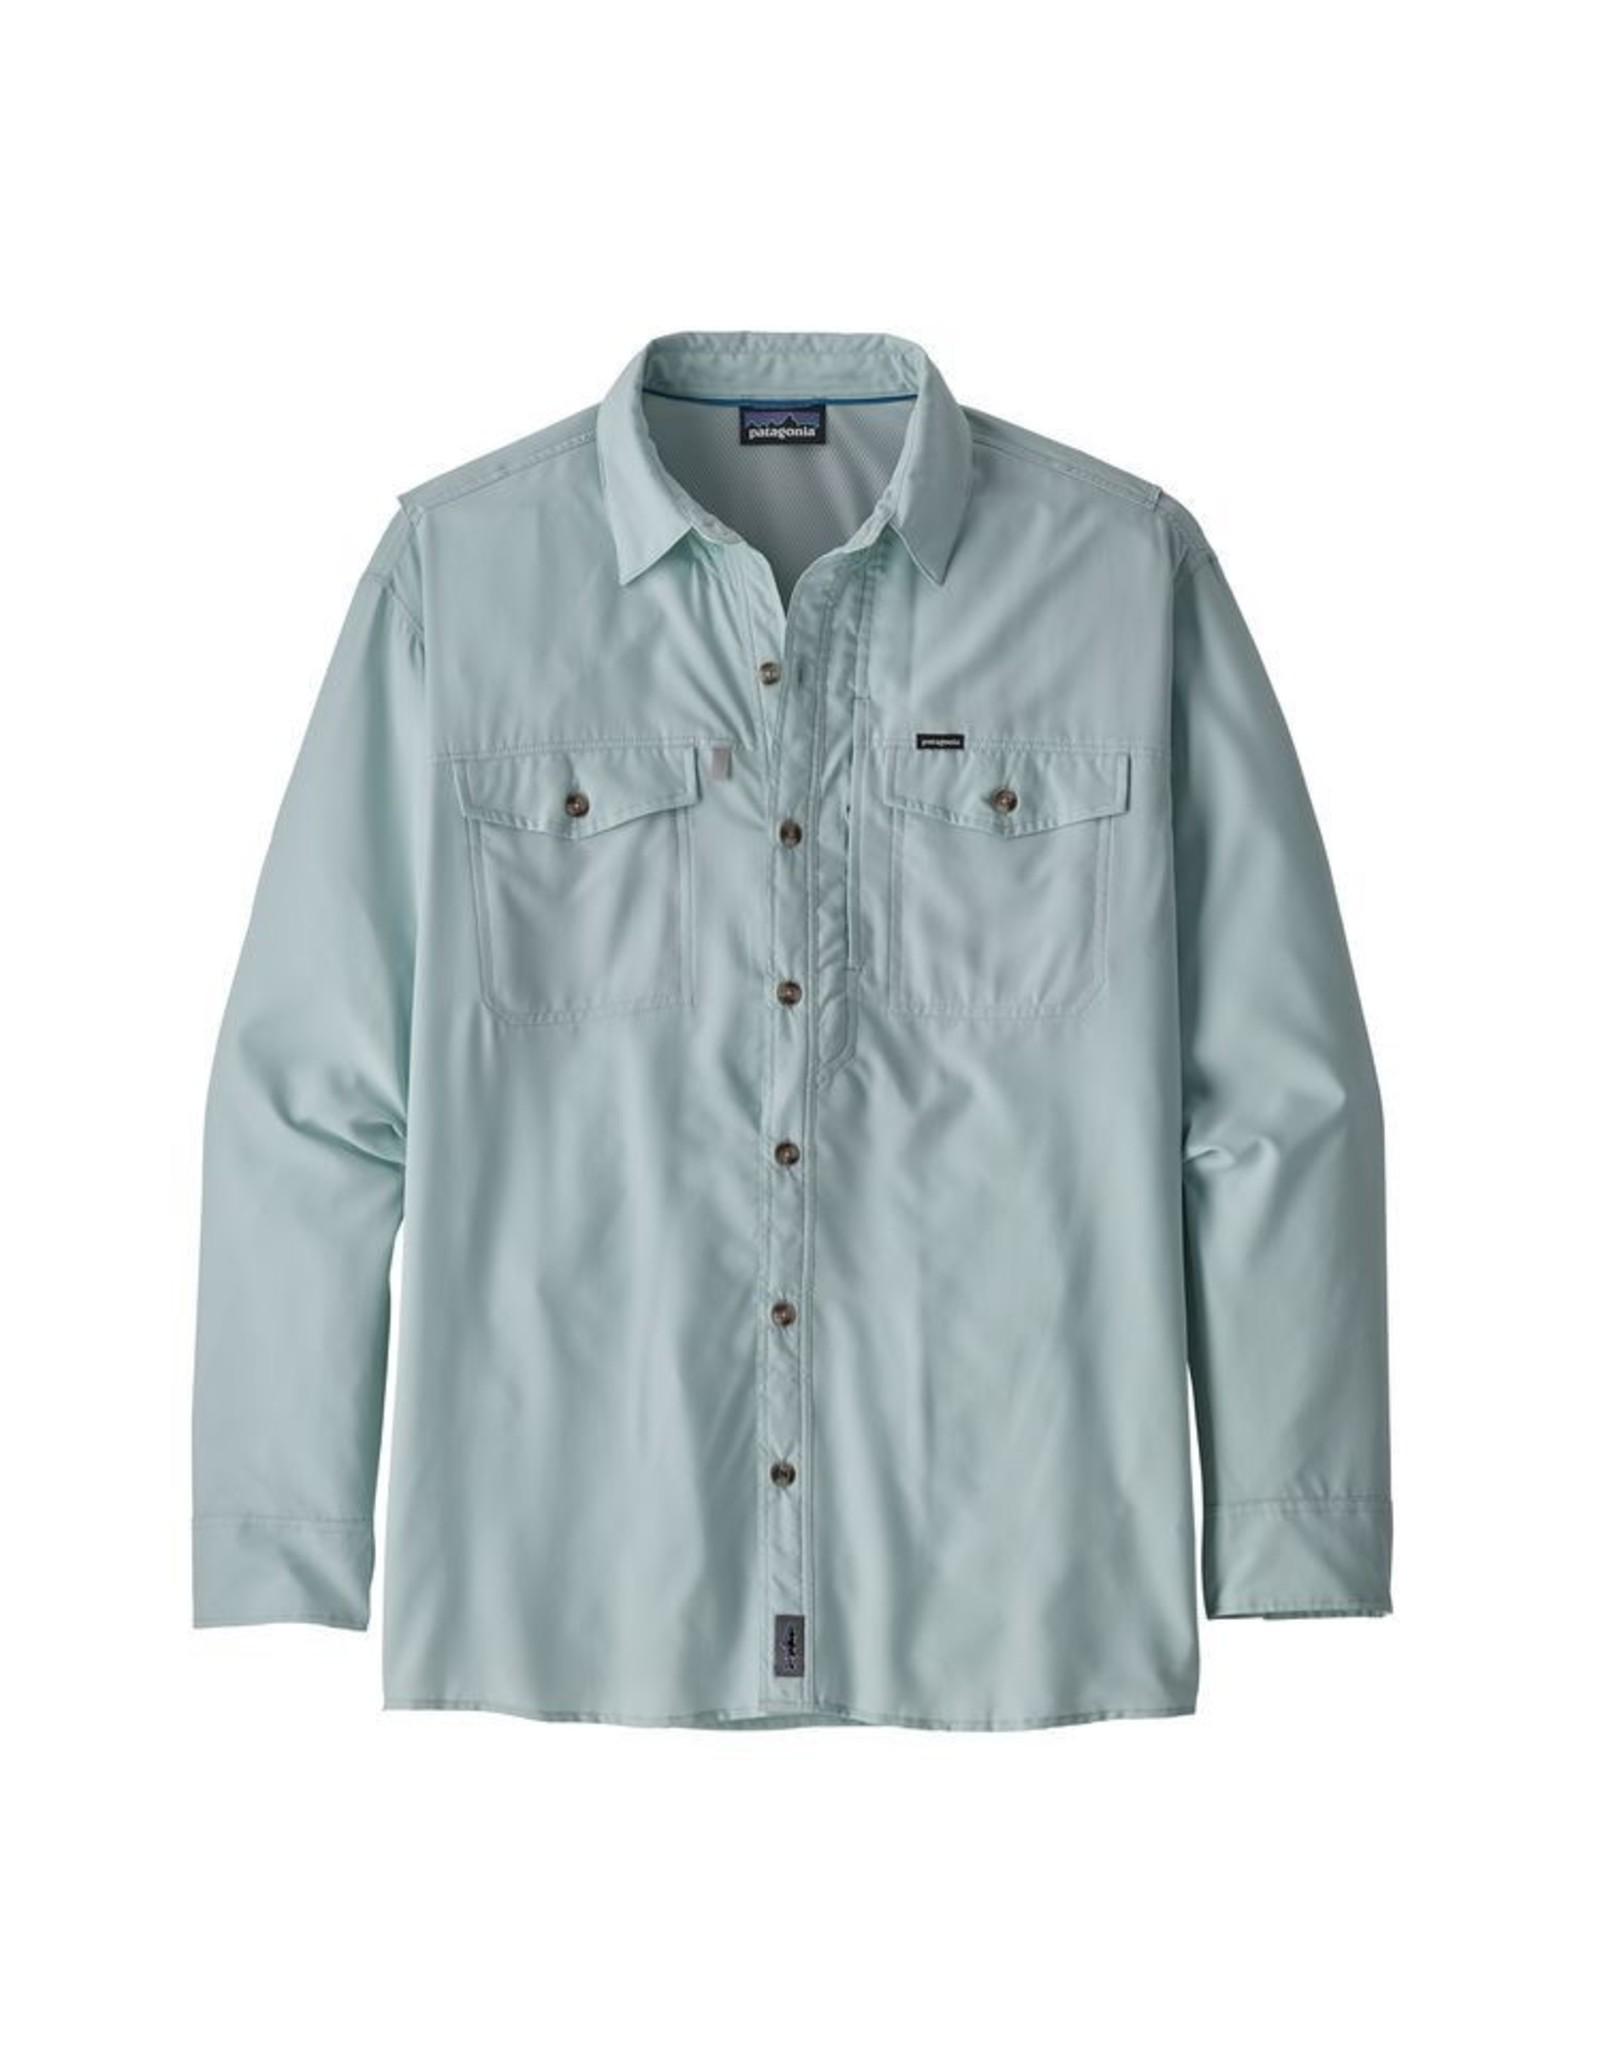 Patagonia Patagonia LS Sol Patrol® II Shirt